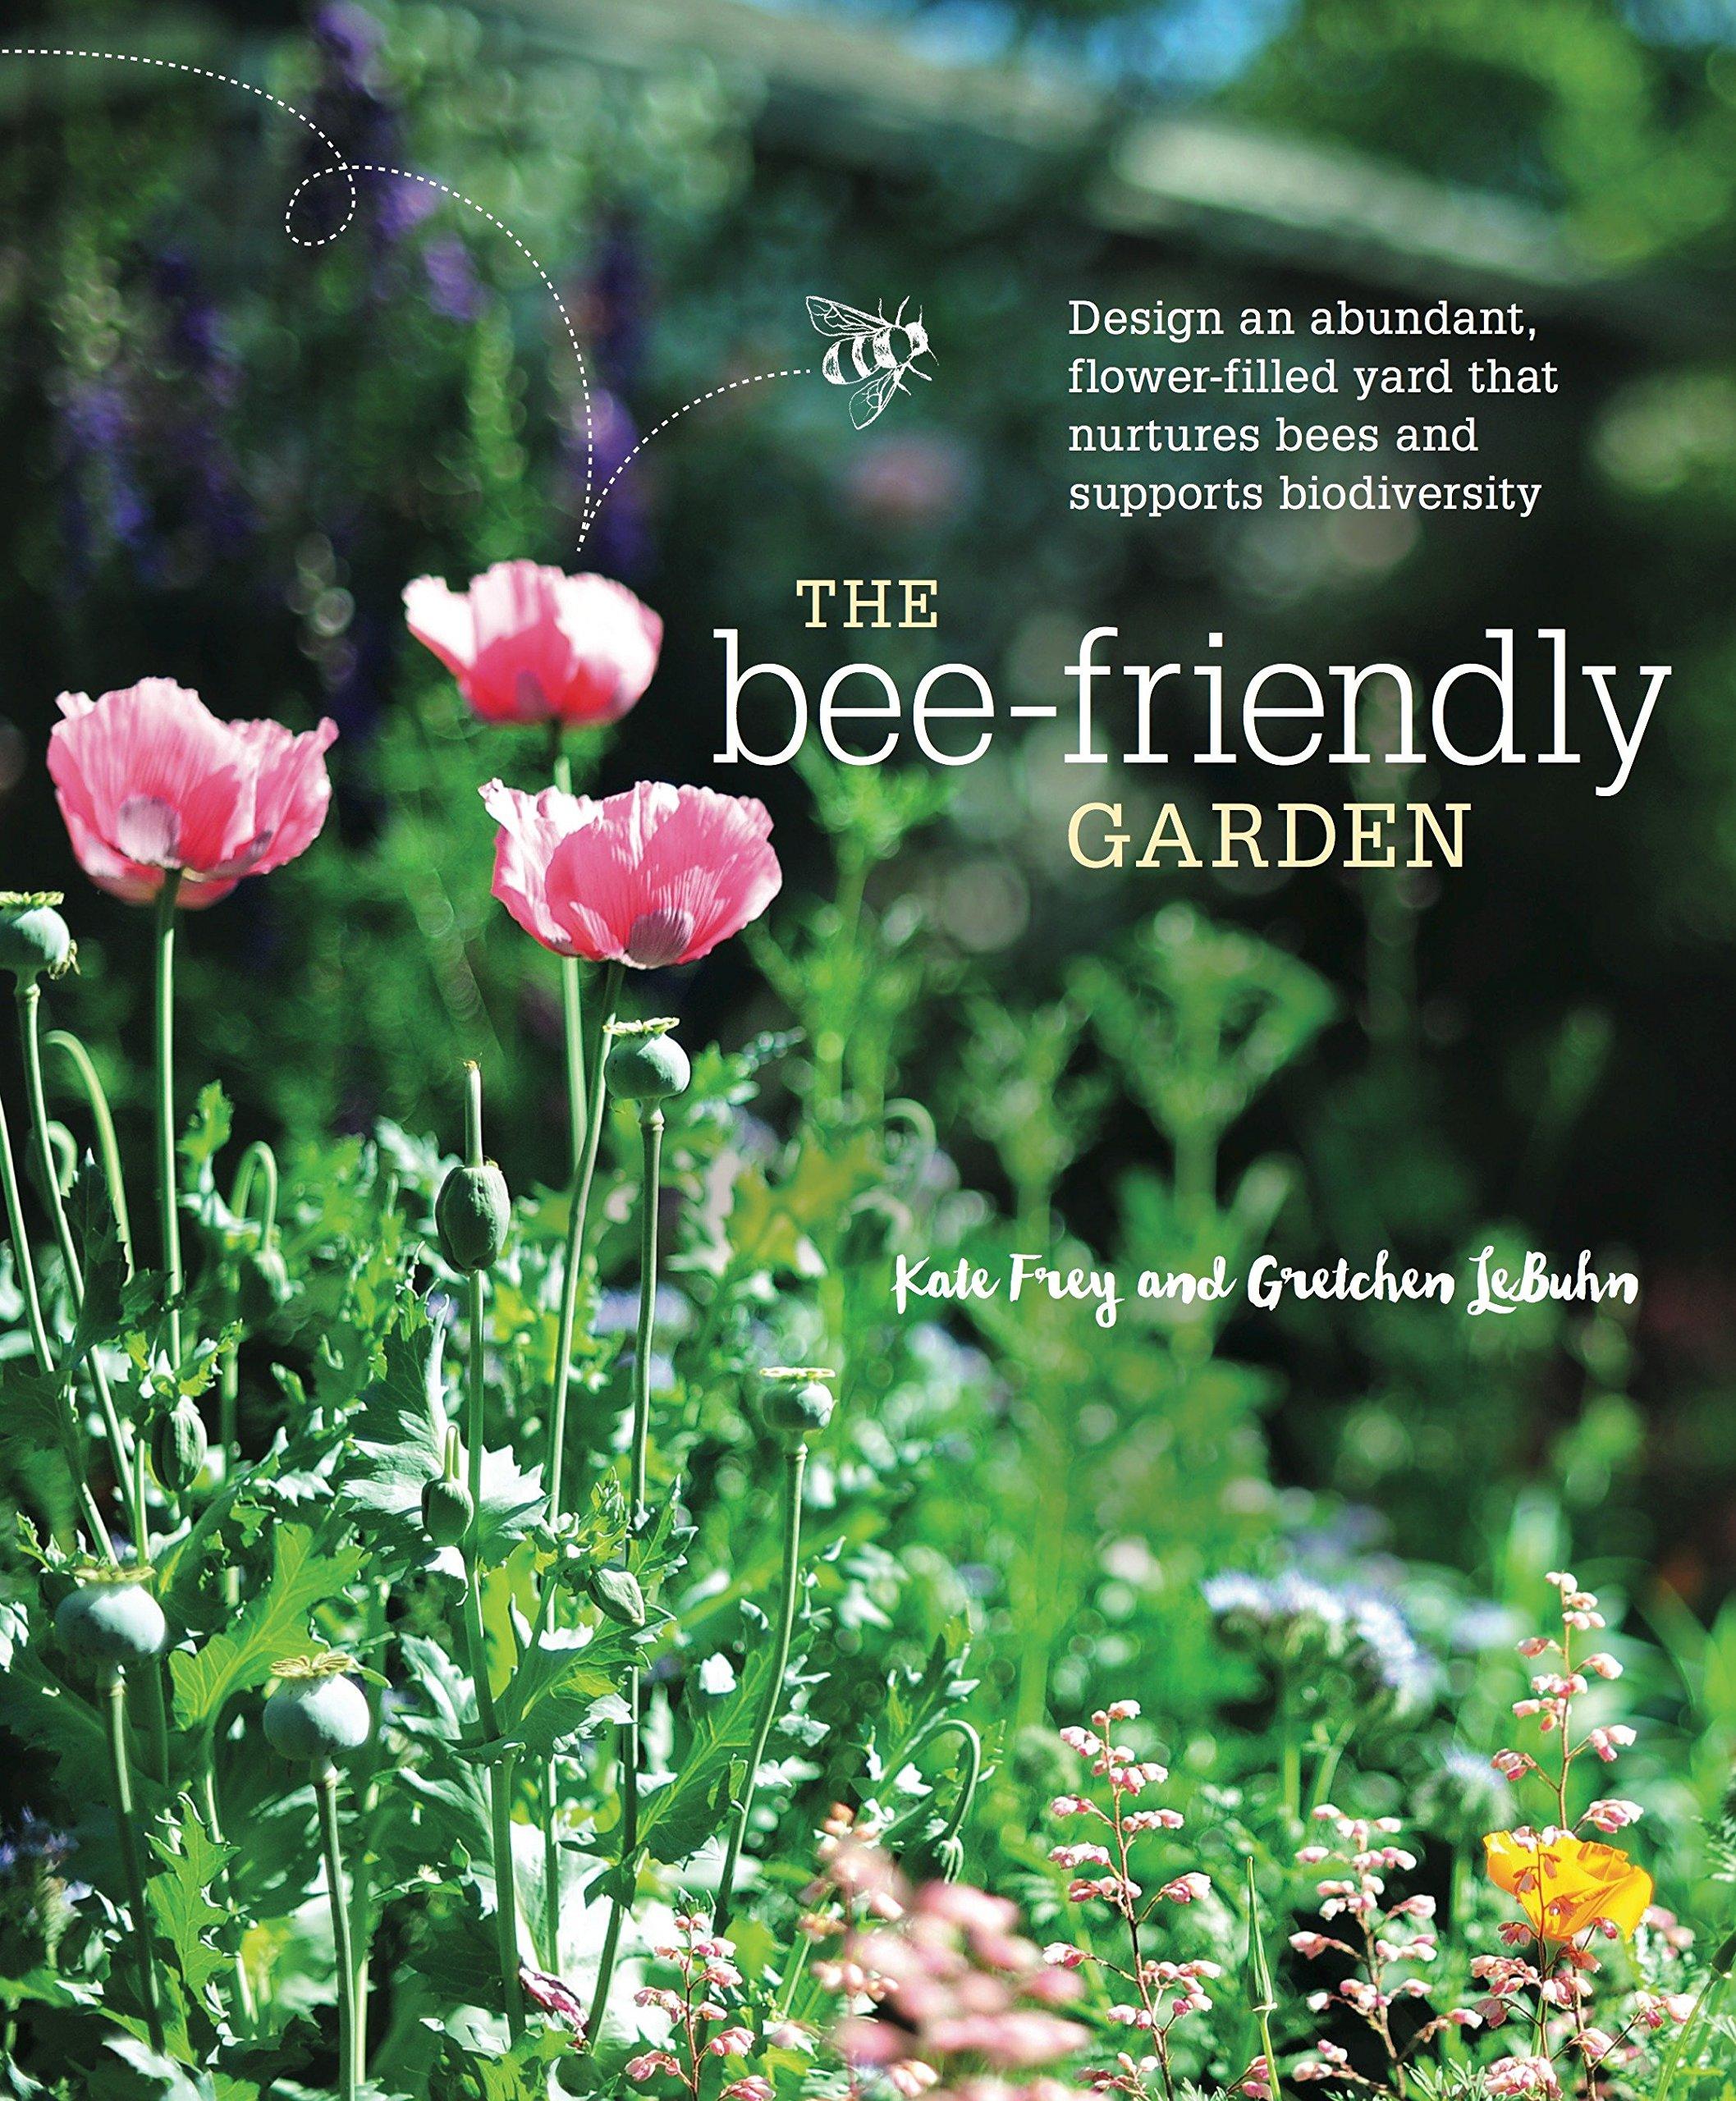 The Bee-Friendly Garden: Design an Abundant, Flower-Filled ... on native perennial garden, native wildflower garden, native plant garden, native bee habitat,